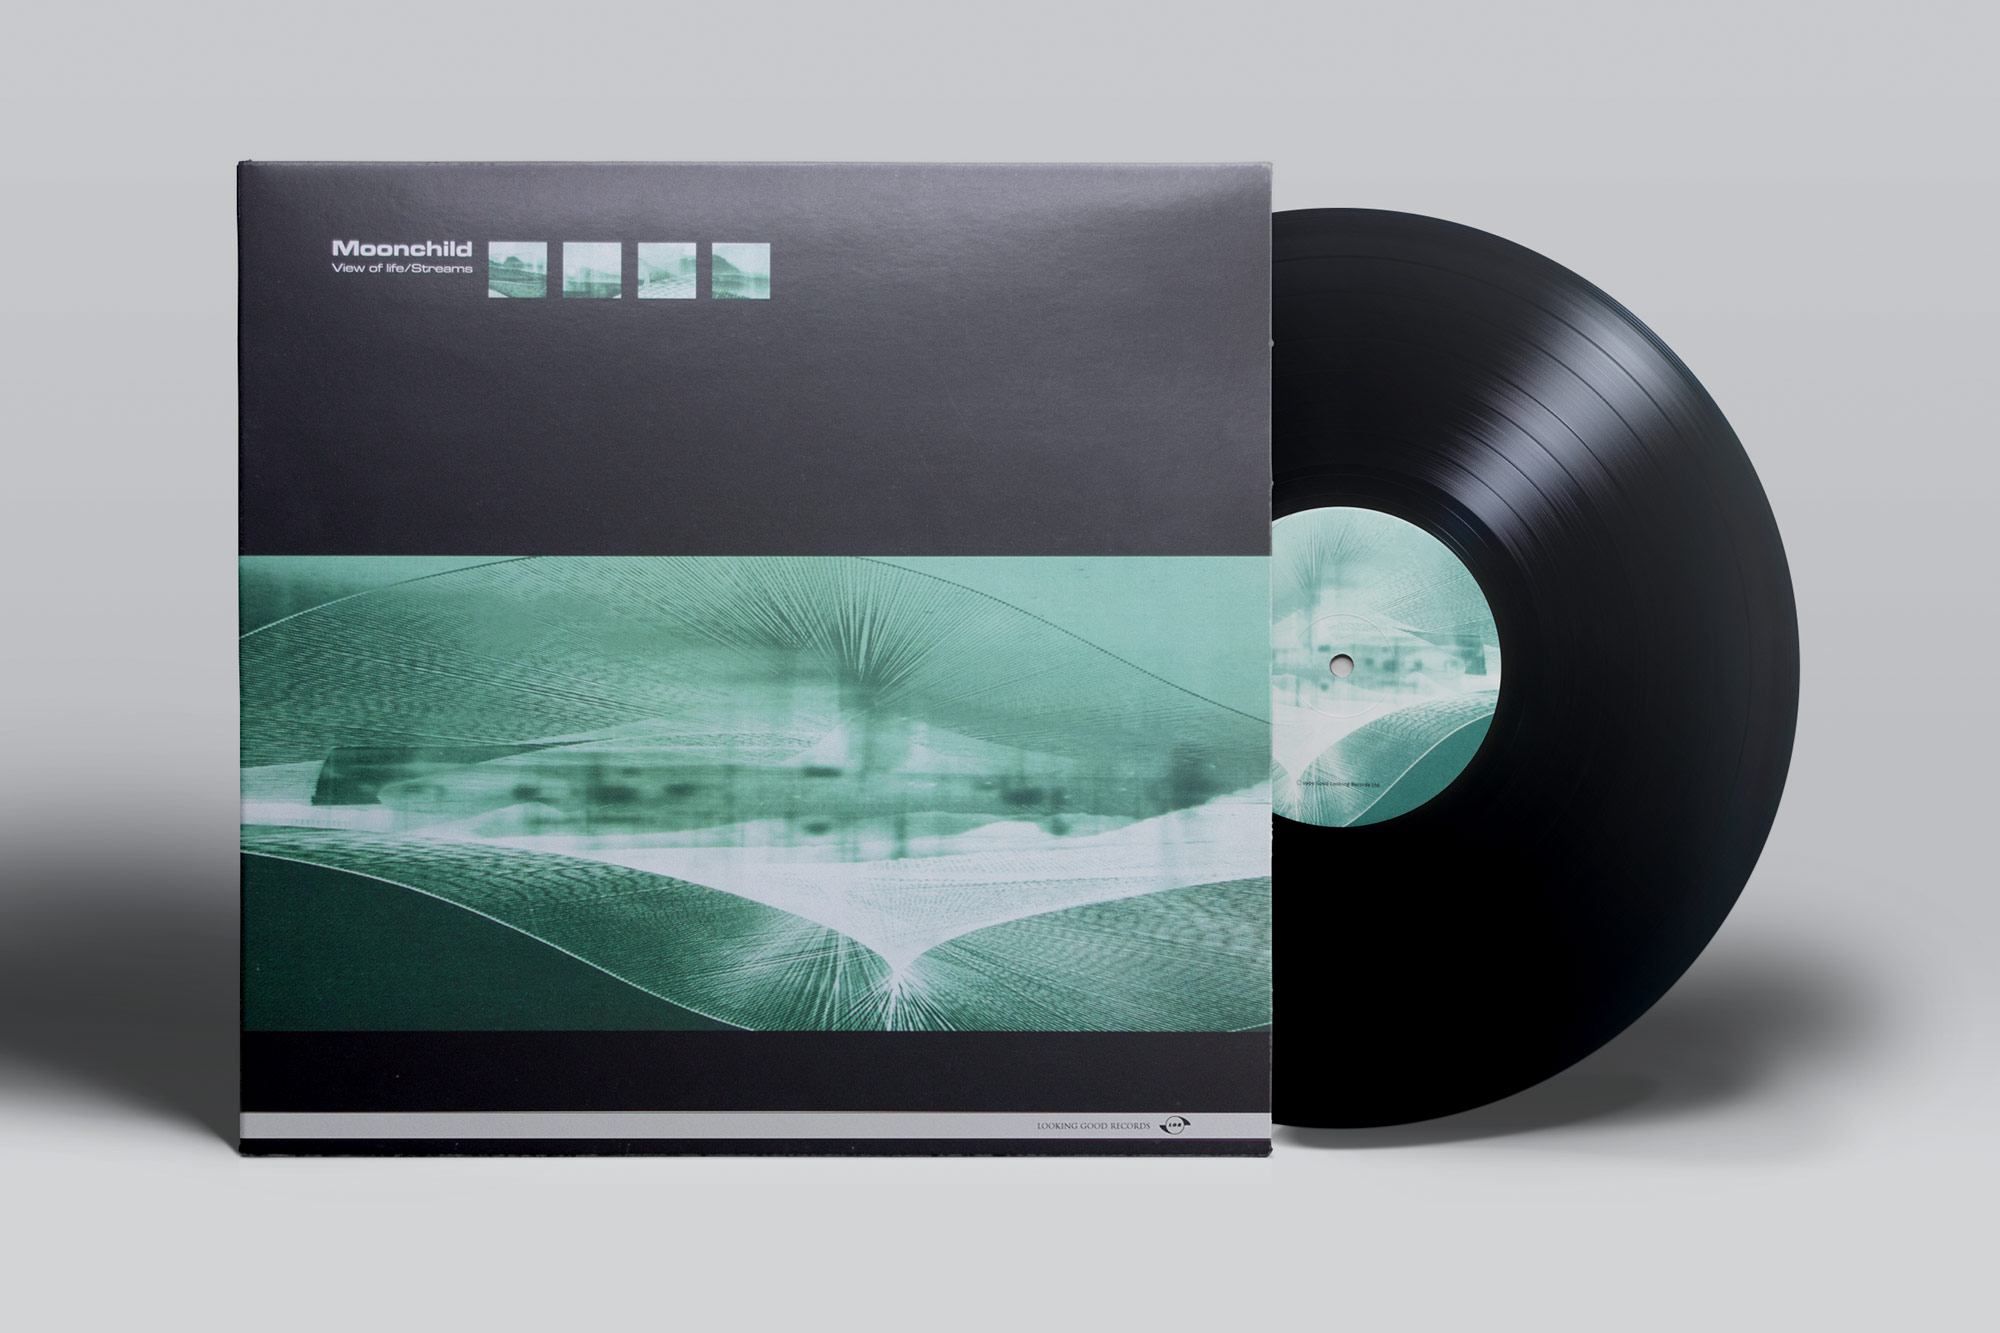 gareth-paul-jones-studio-design-looking-good-records-12-covers-cs-10-LGR026